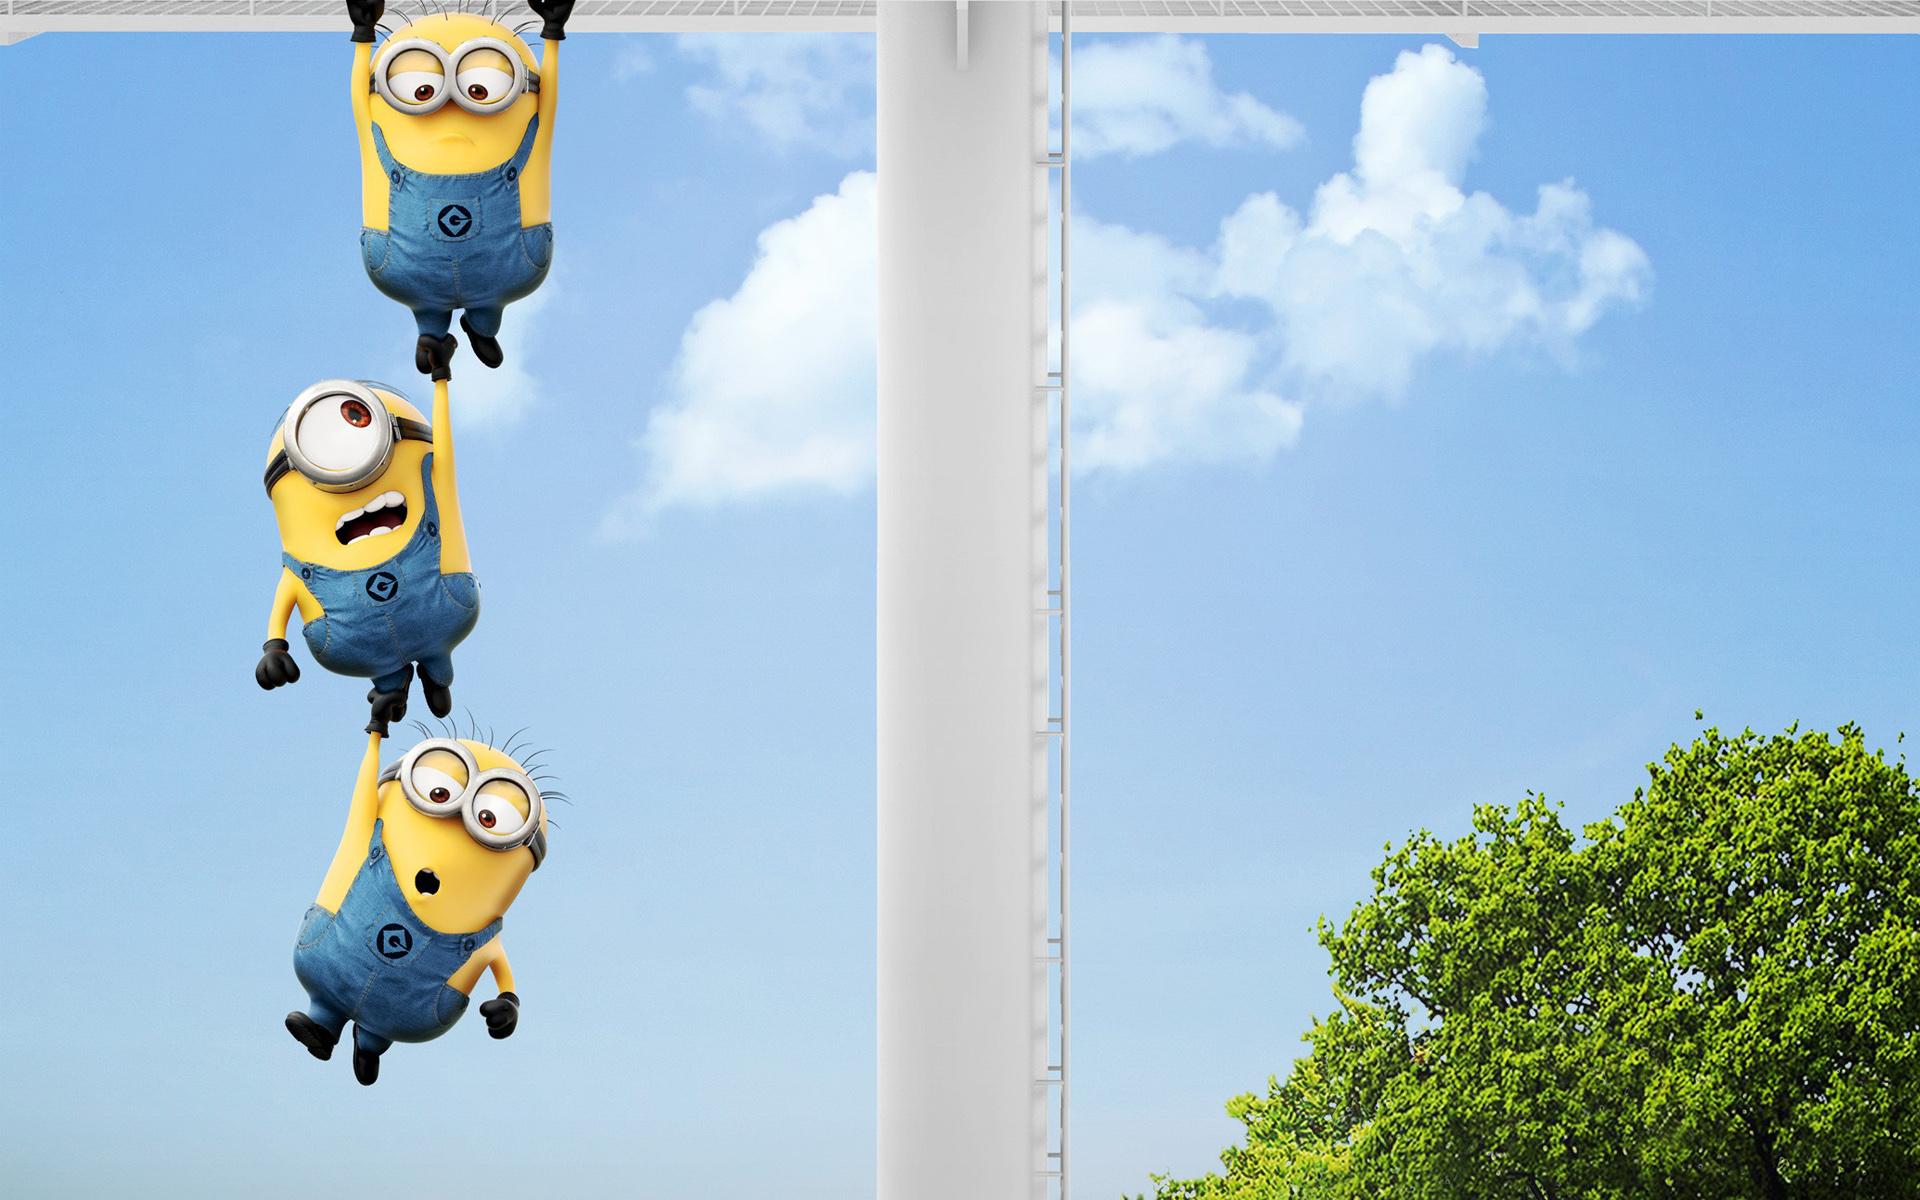 55 cute minion wallpapers hd for desktop